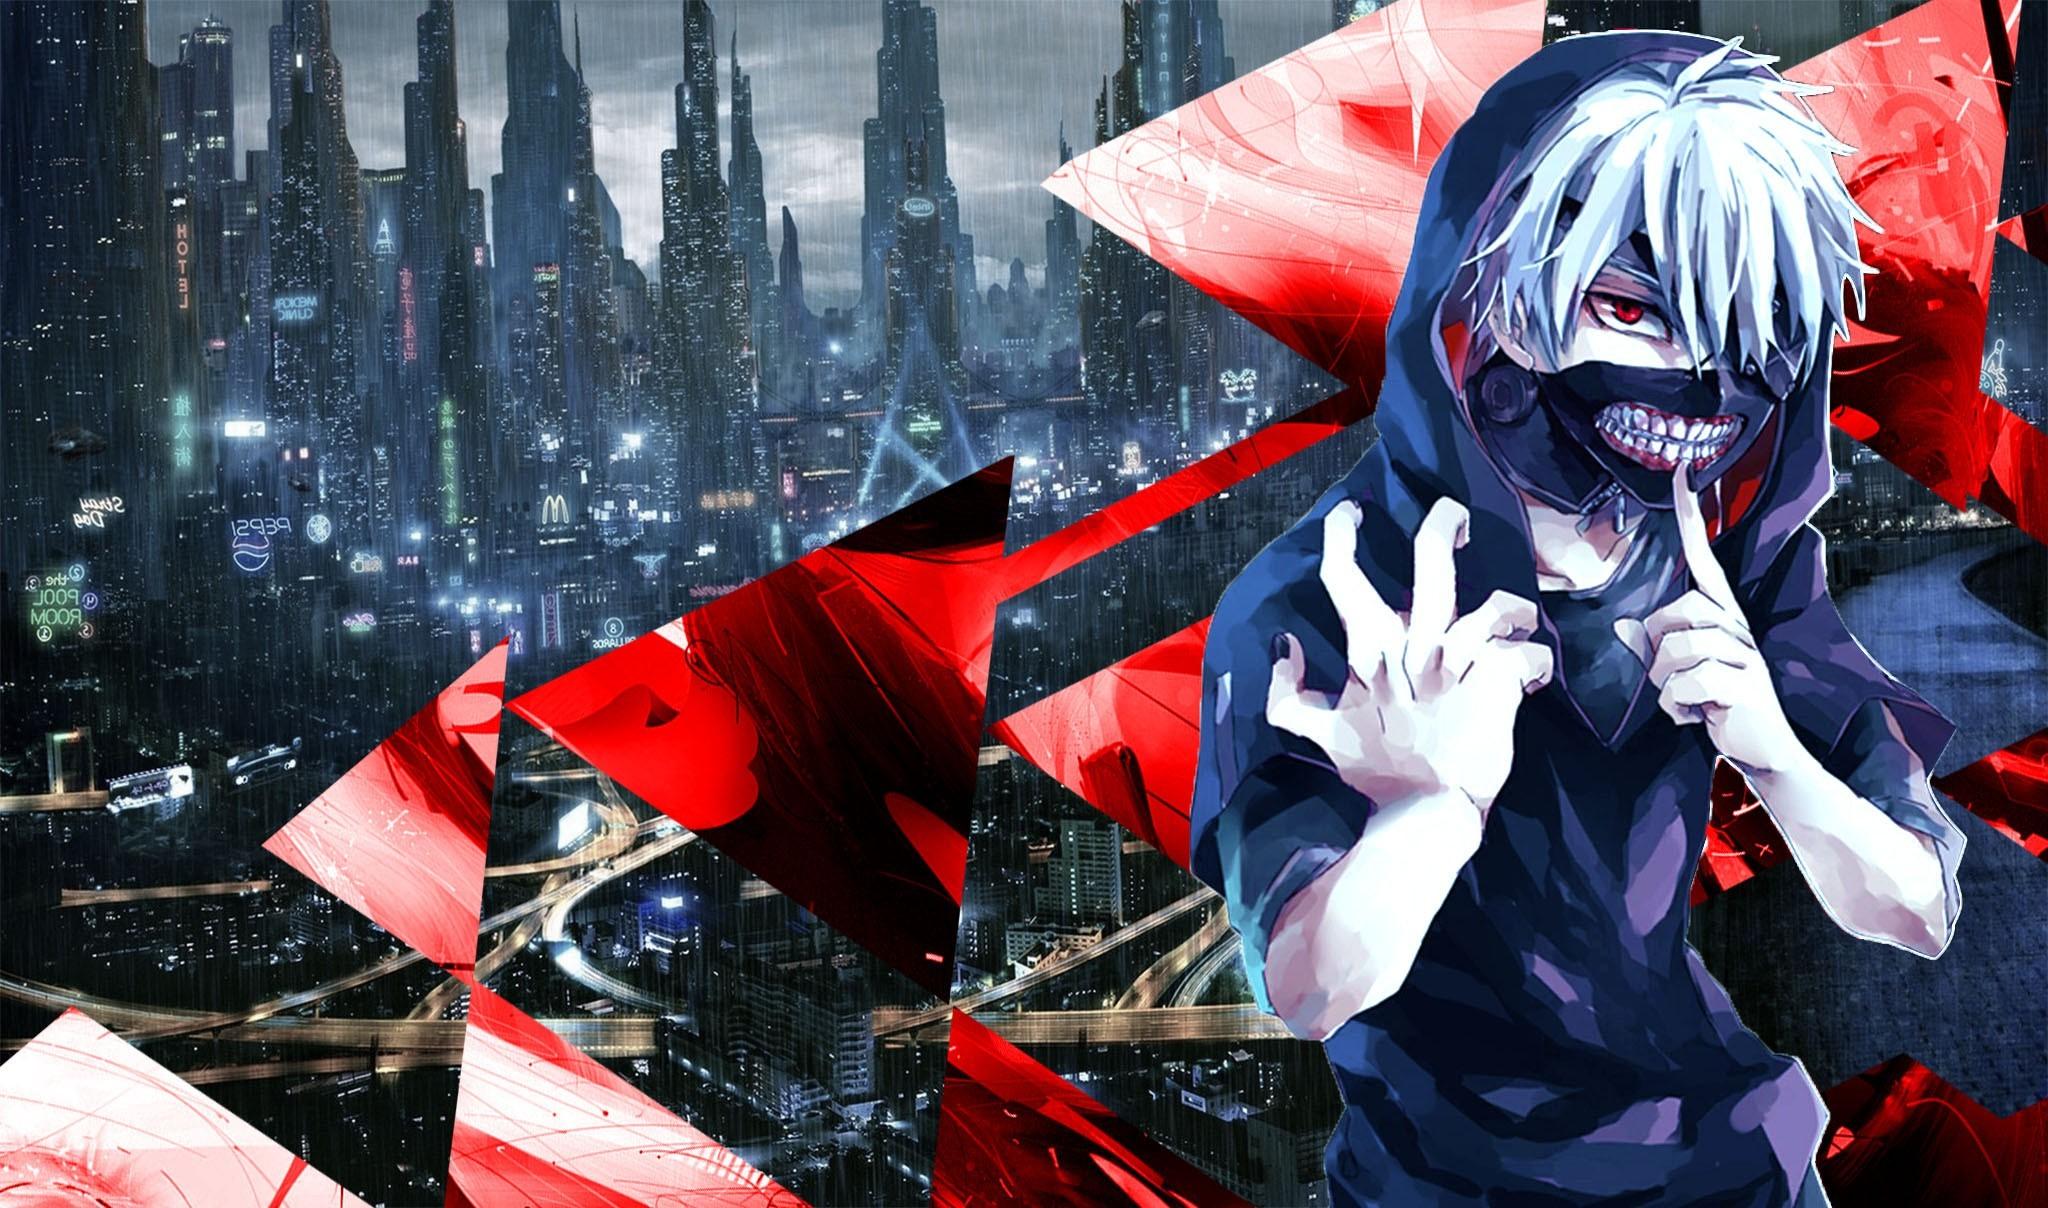 Tokyo ghoul re wallpaper 83 images - Tokyo anime wallpaper ...